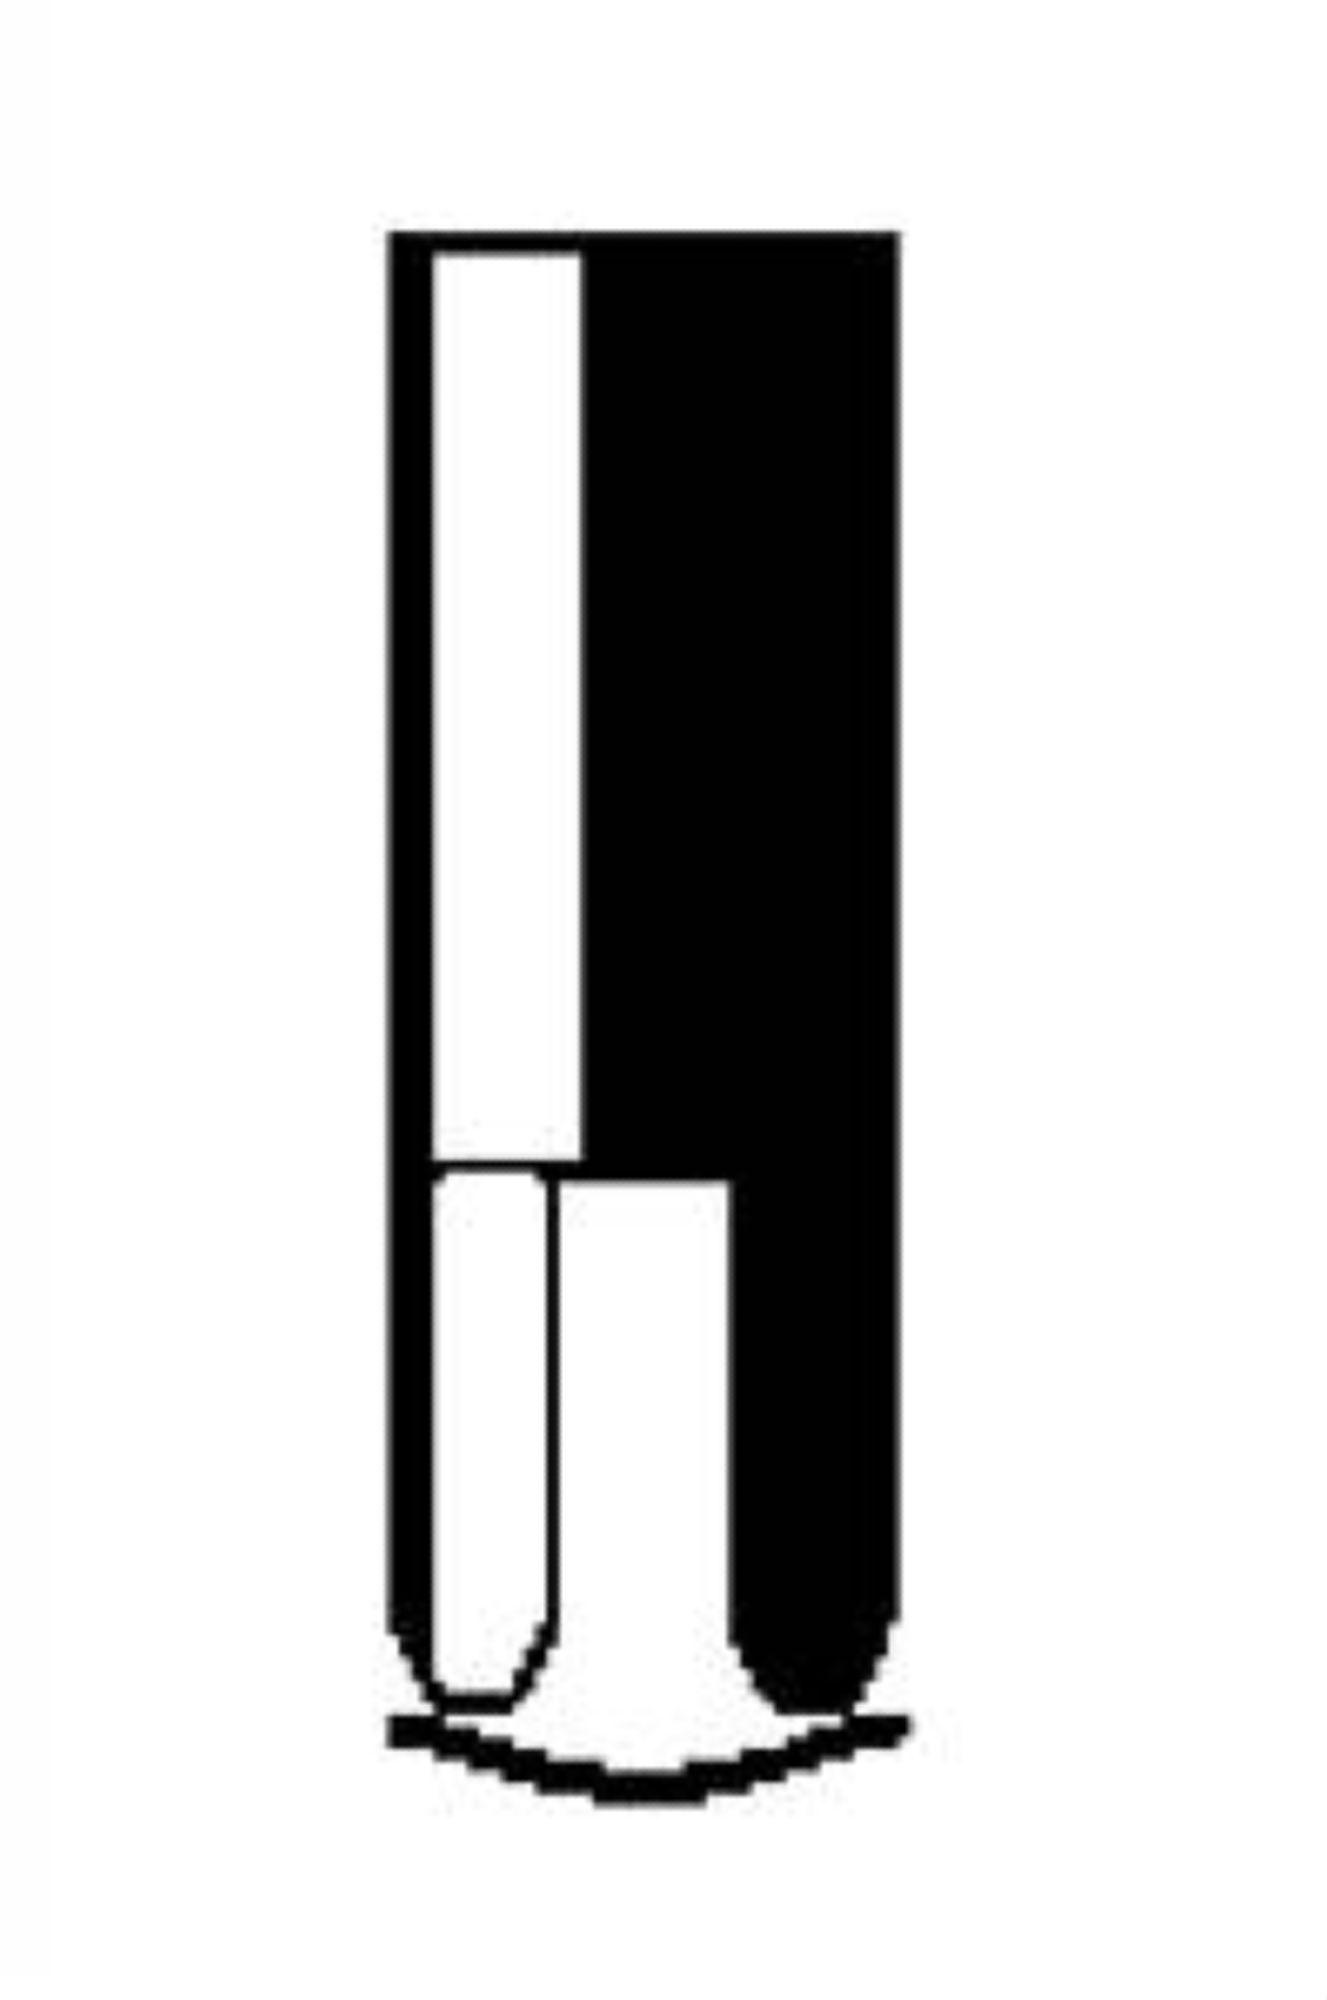 jp_probe_type5.png